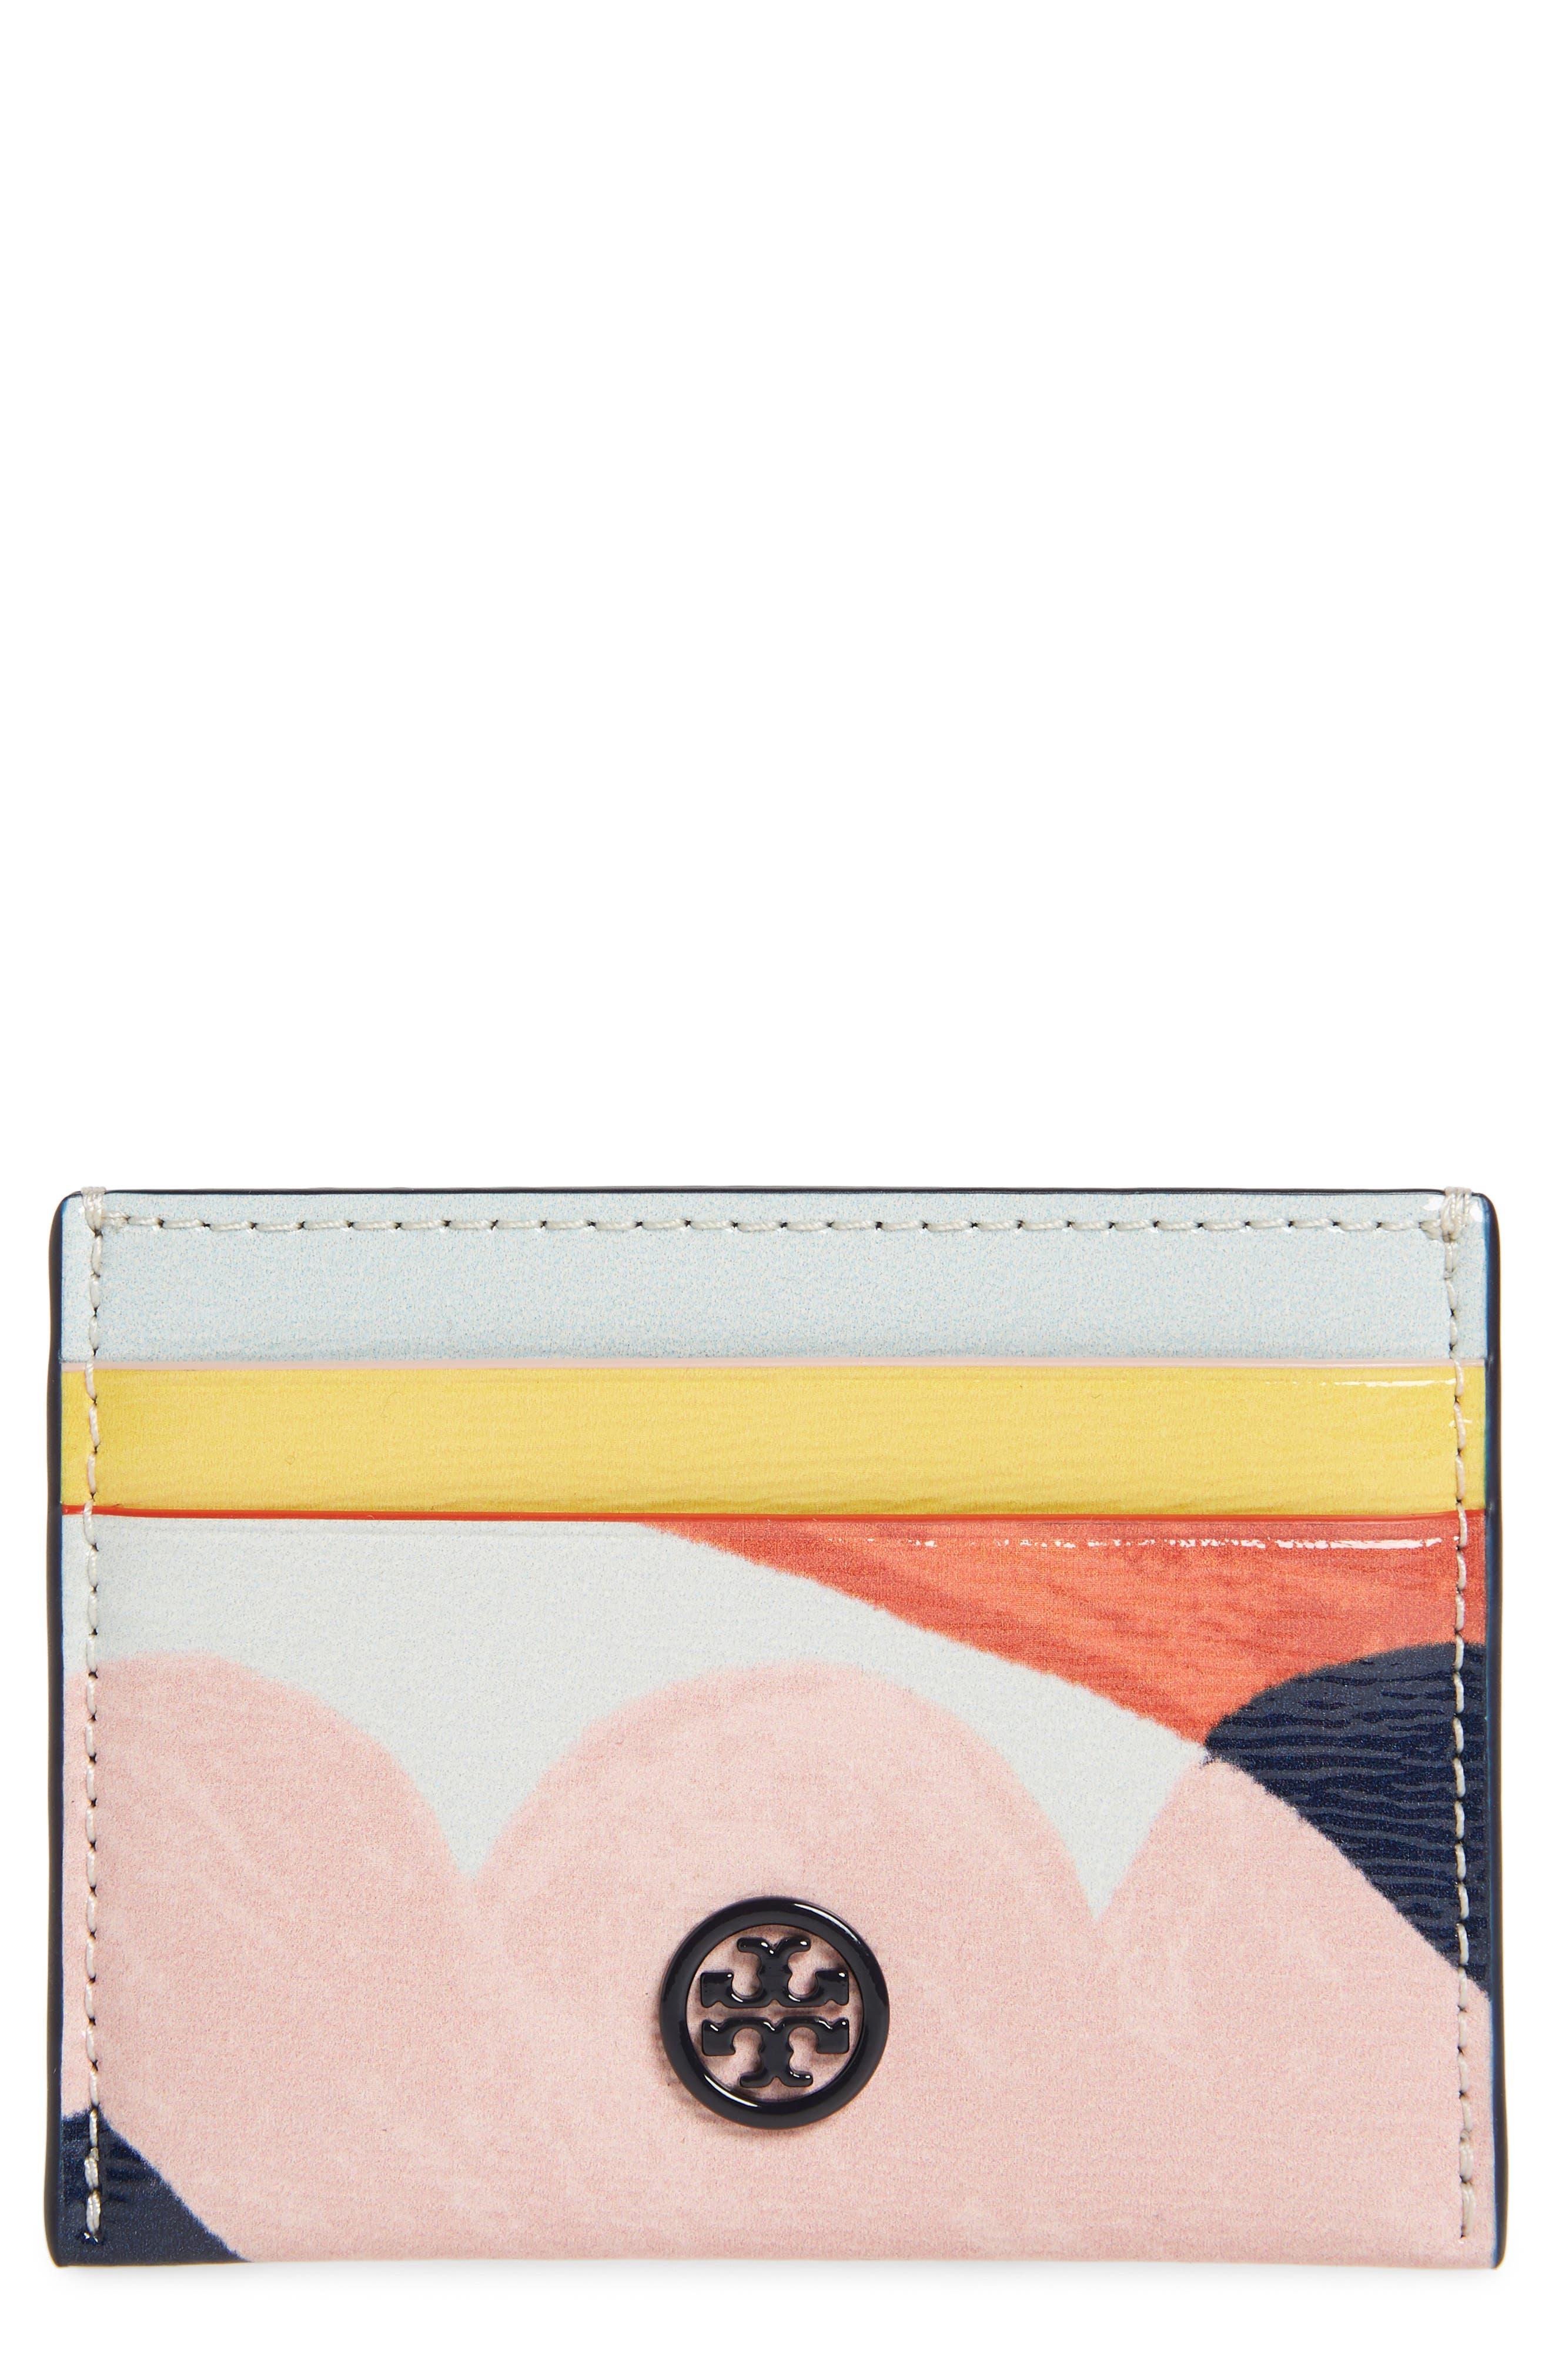 Robinson Leather Card Case,                             Main thumbnail 1, color,                             INSIDE THE BOX